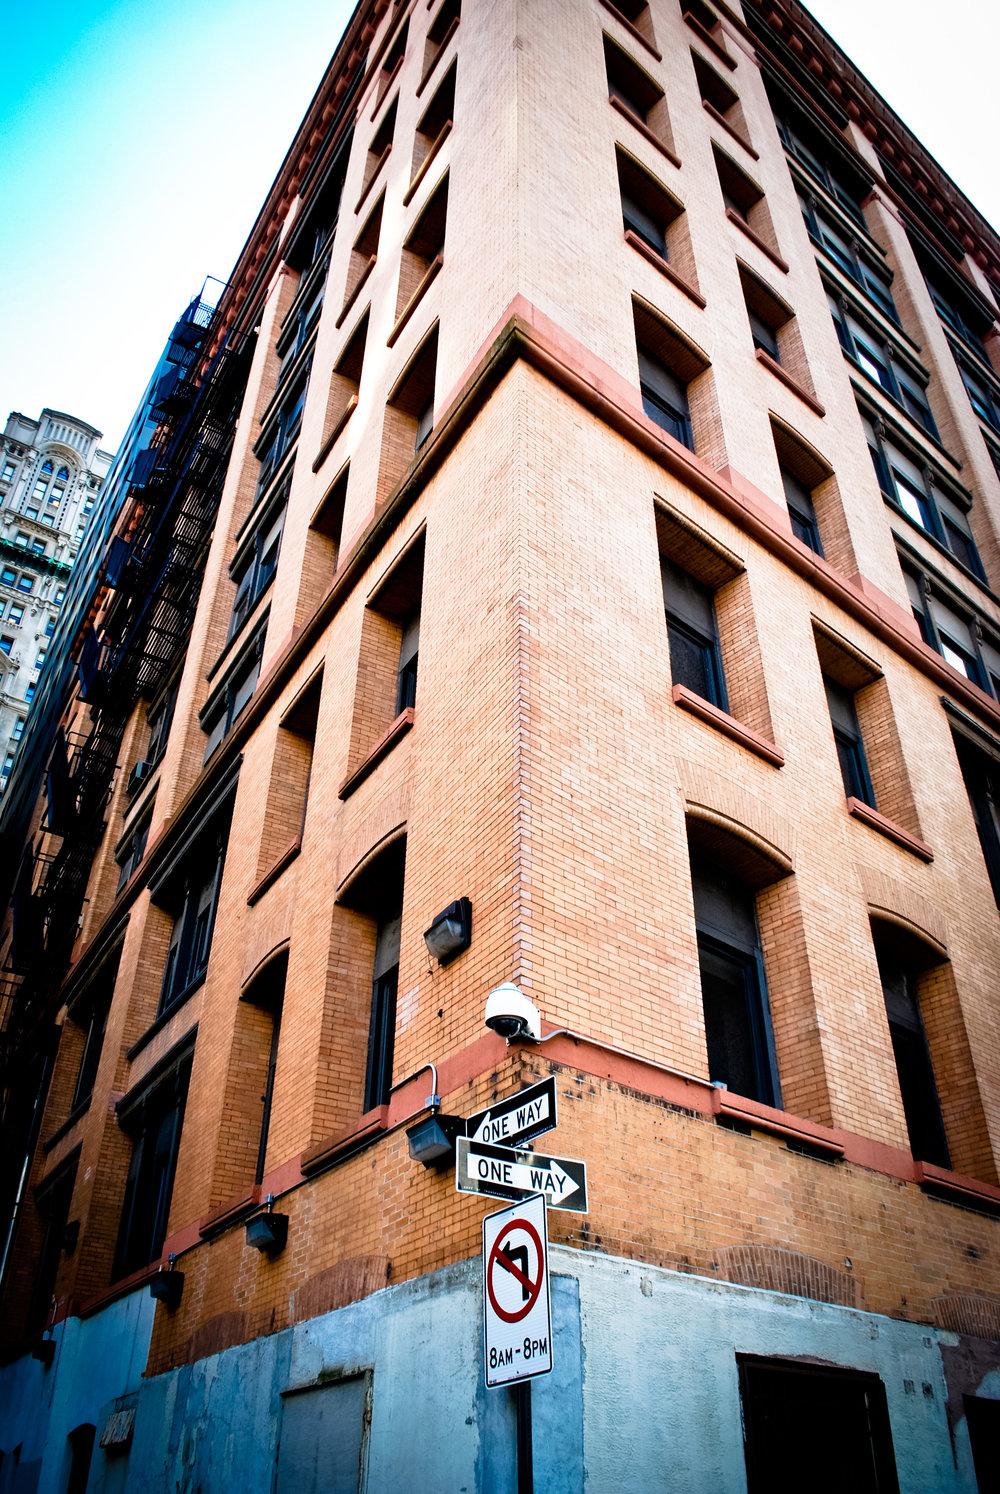 Kaci Nicole - NYE in NYC - Street Corner